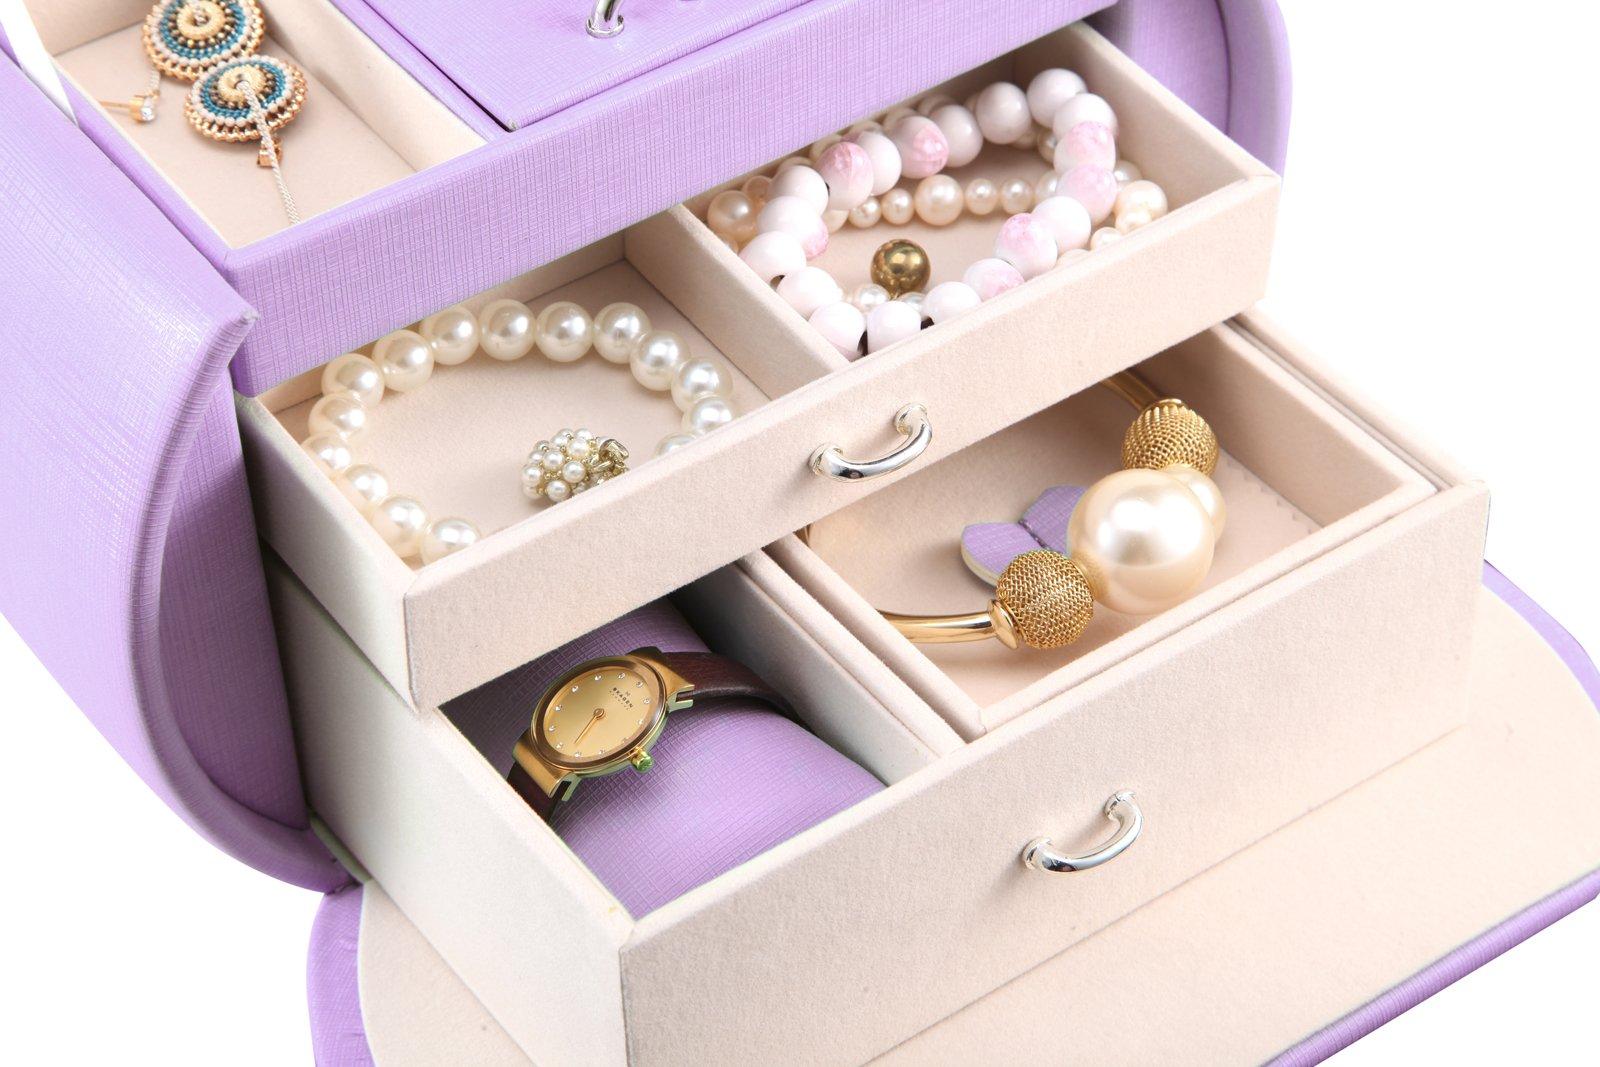 Vlando Princess Style Jewelry Box from Netherlands Design Team, Fabulous Christmas Gift for Girls (Purple) by Vlando (Image #6)